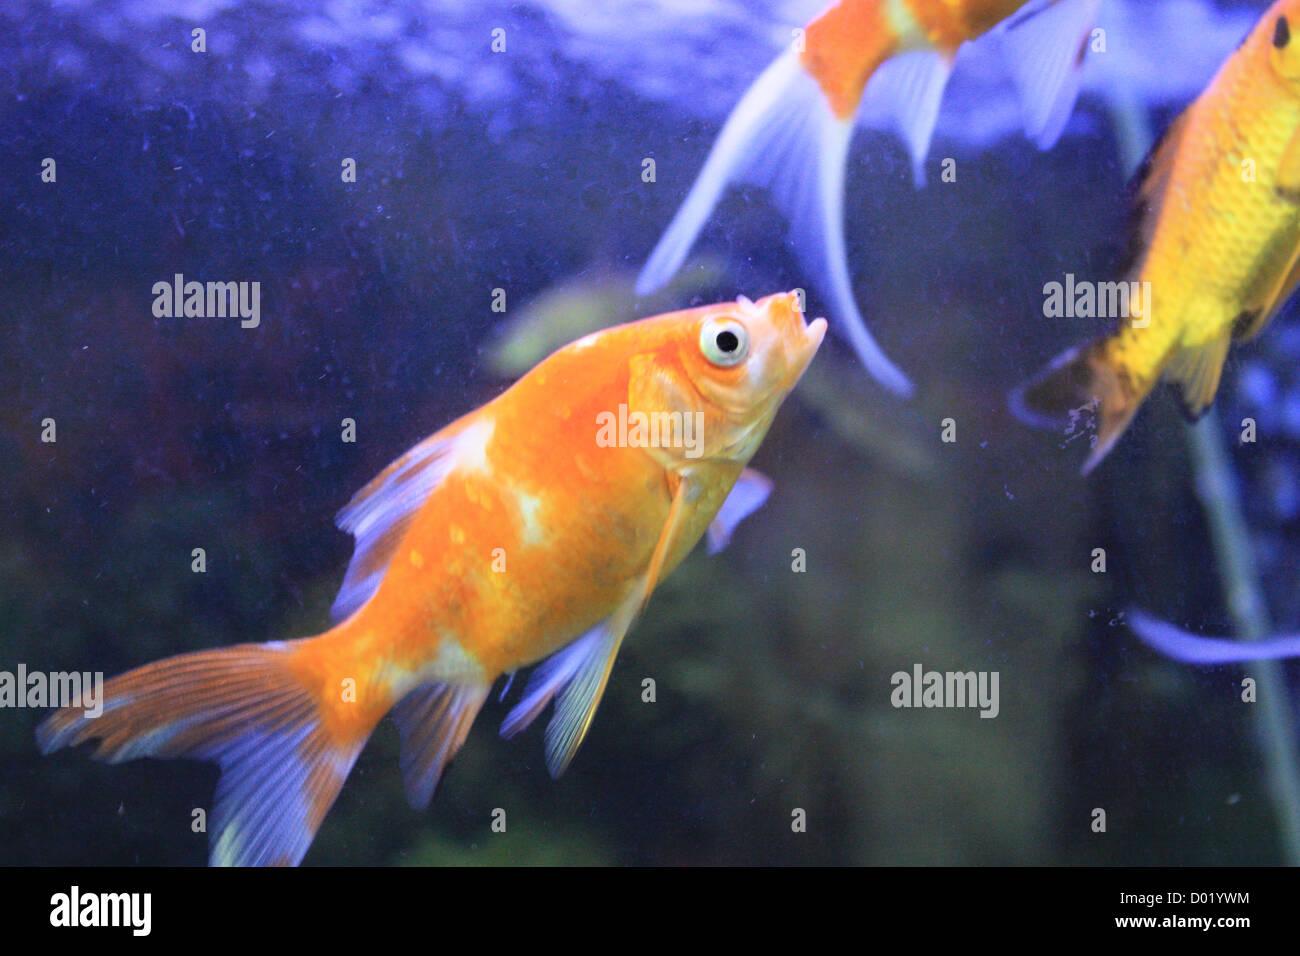 Pesci di acqua dolce pesci d 39 acquario pesci tropicali for Pesce pulitore acqua dolce